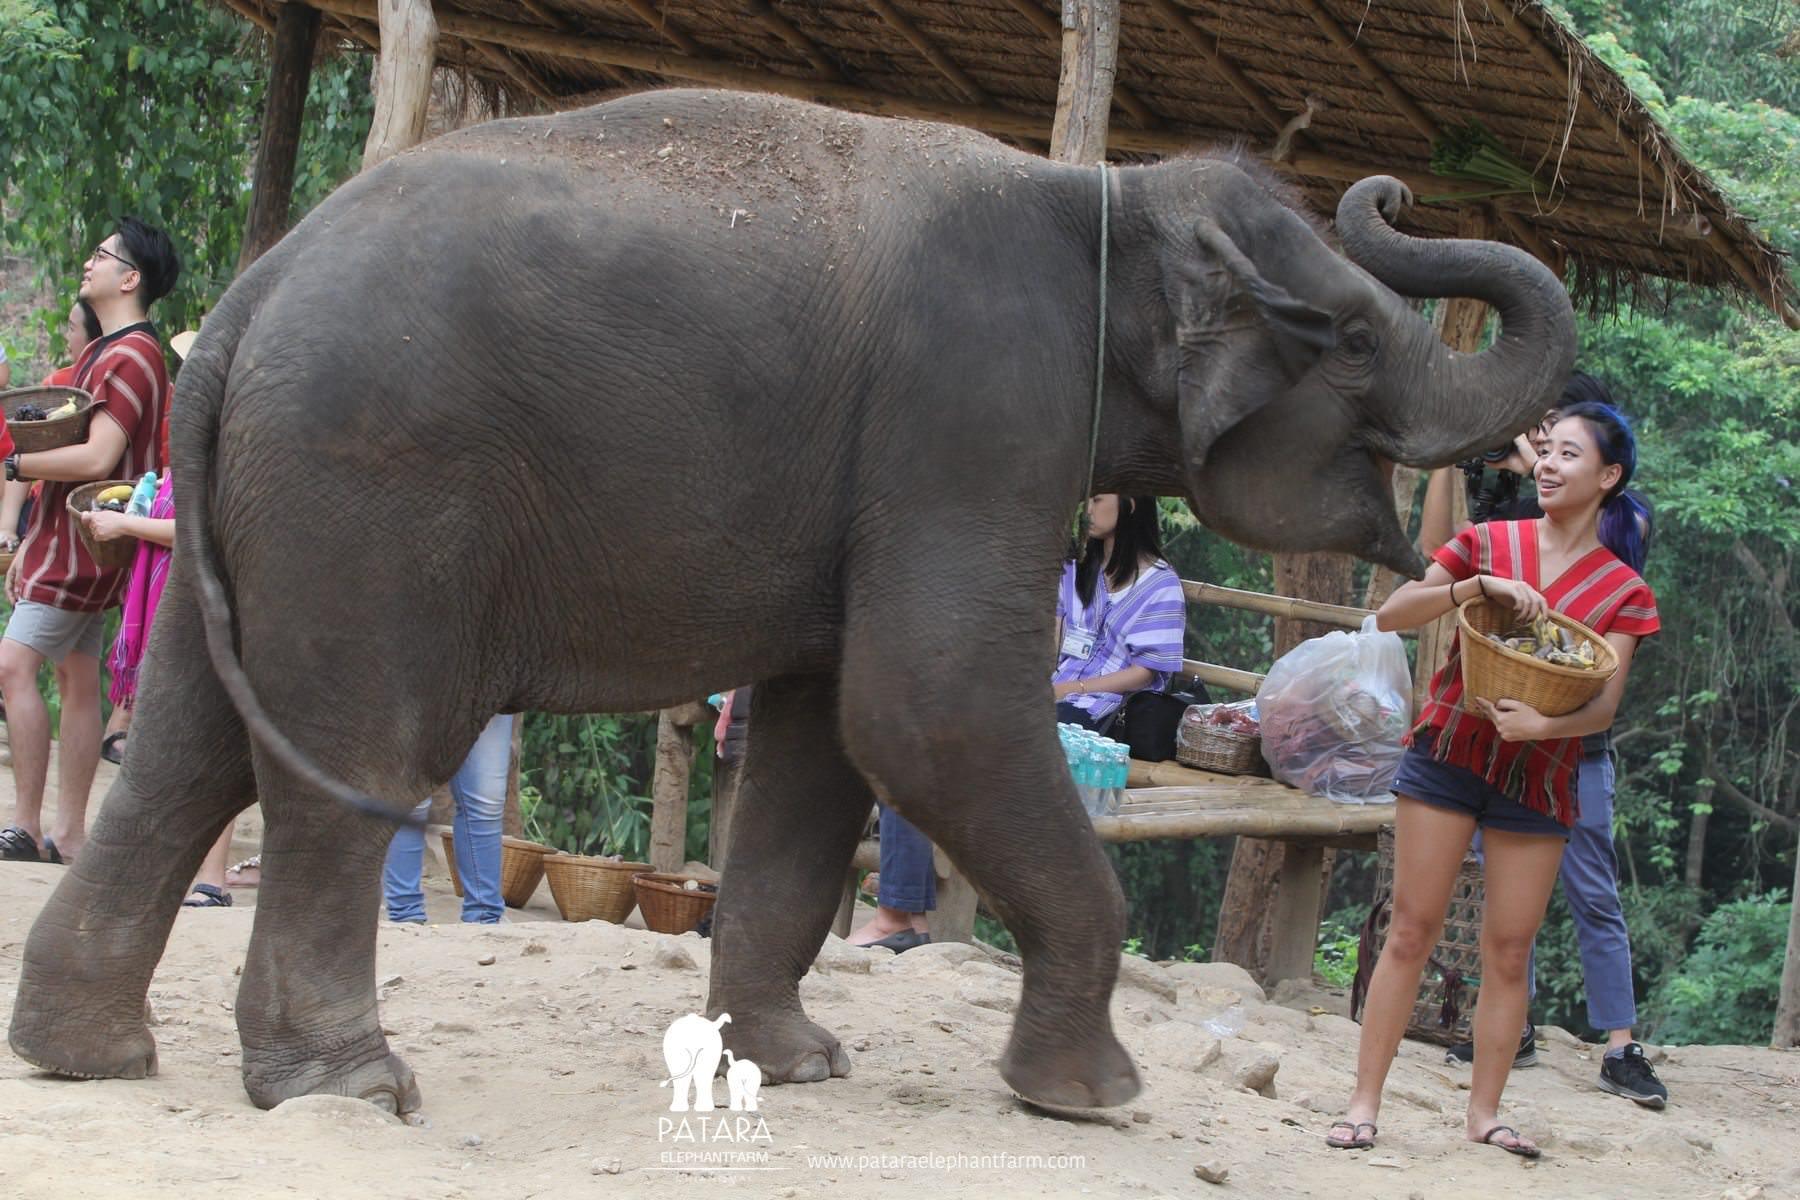 PataraElephantFarm-ChiangMai-Feeding